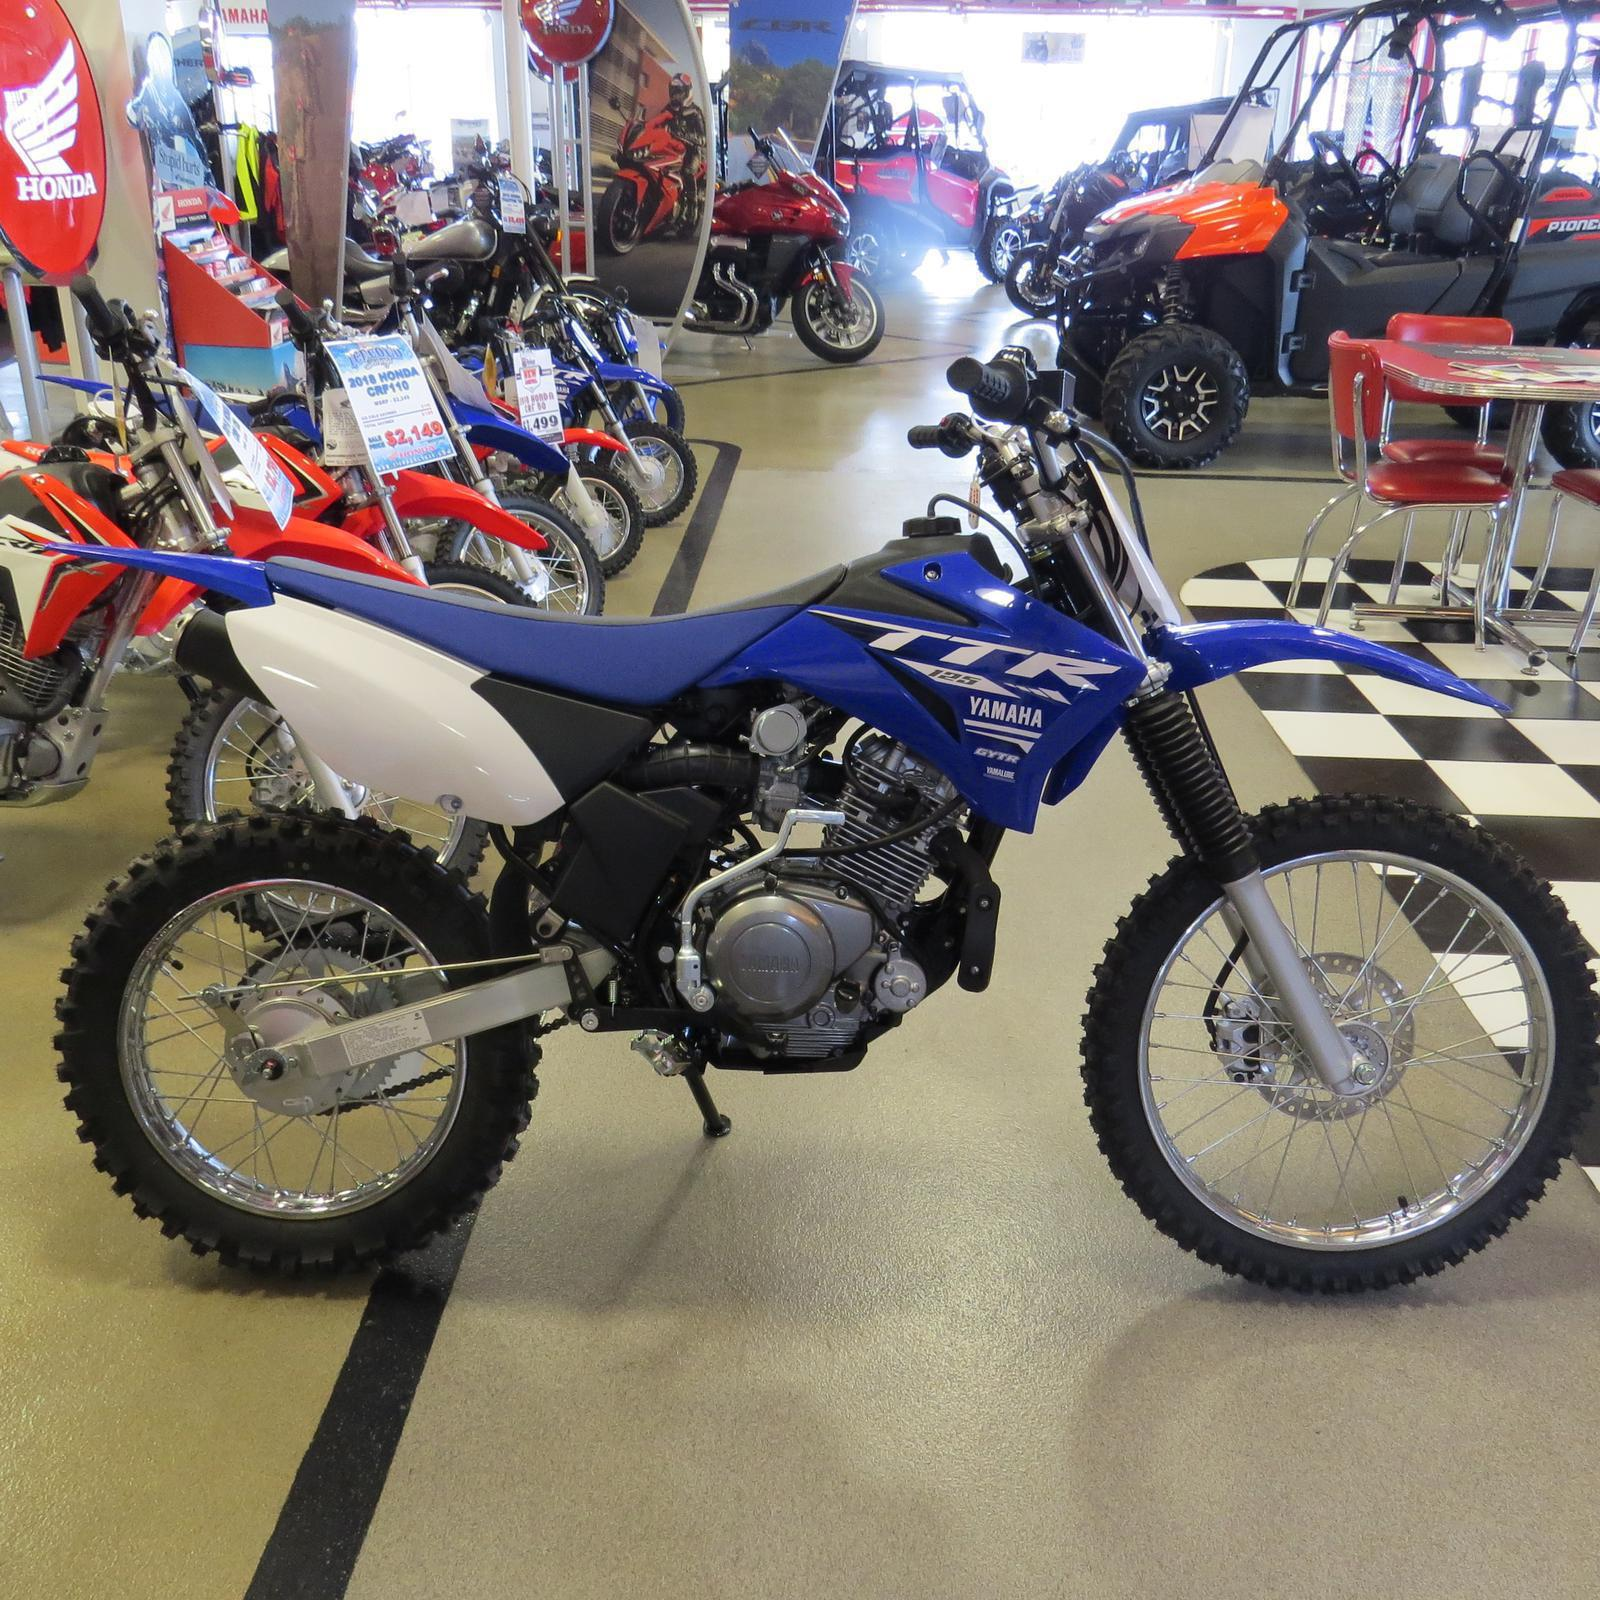 Yamaha Ttr 125 >> 2018 Yamaha Tt R 125le Ttr125 For Sale In Litchfield Il Niehaus